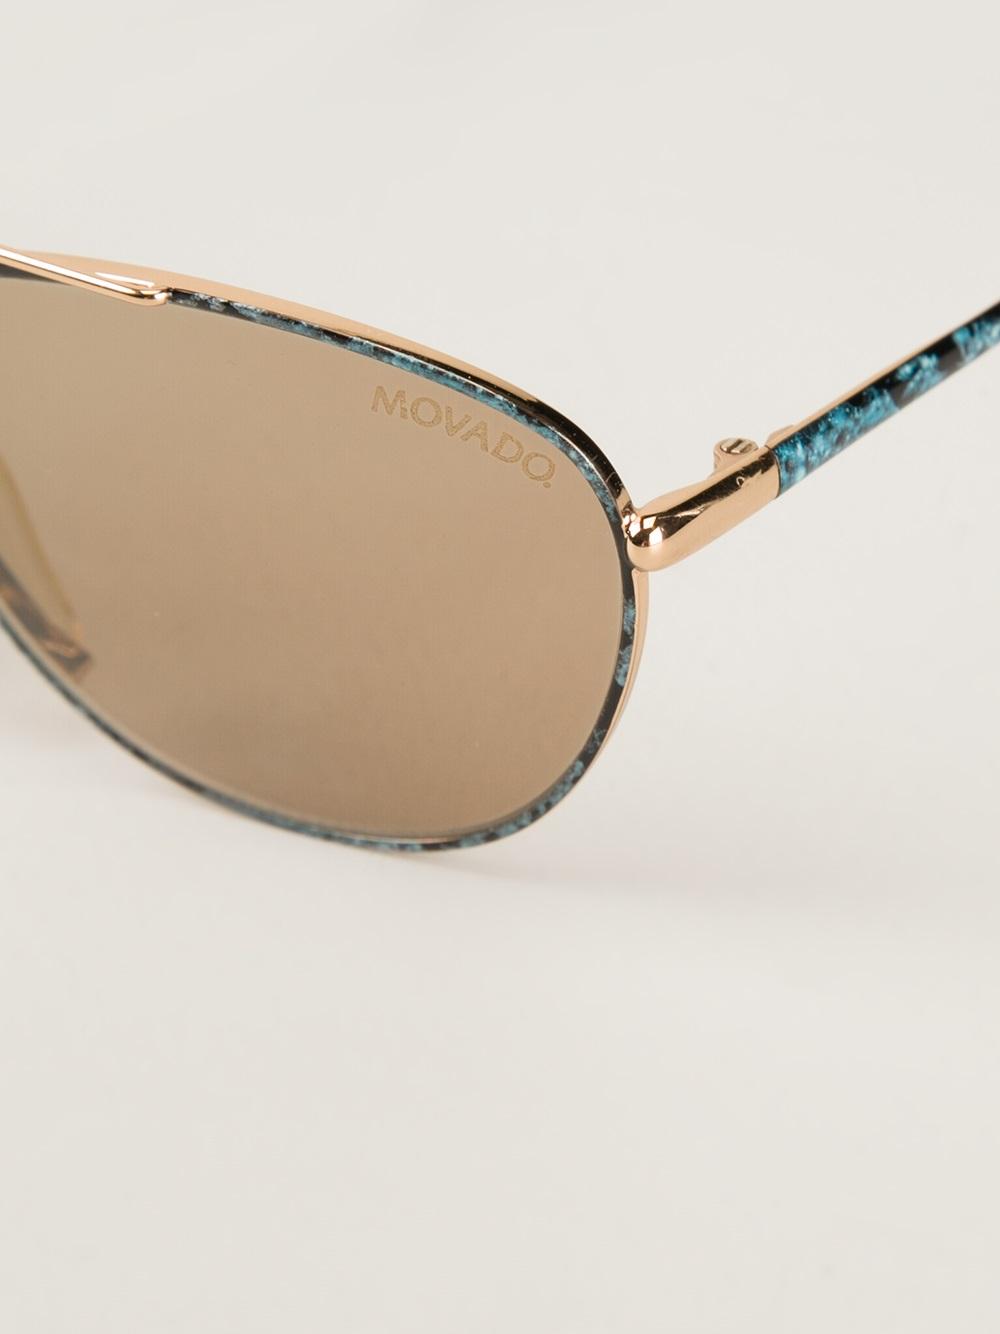 Gold Frame Carrera Sunglasses : Carrera Oval Frame Sunglasses in Gold (metallic) Lyst